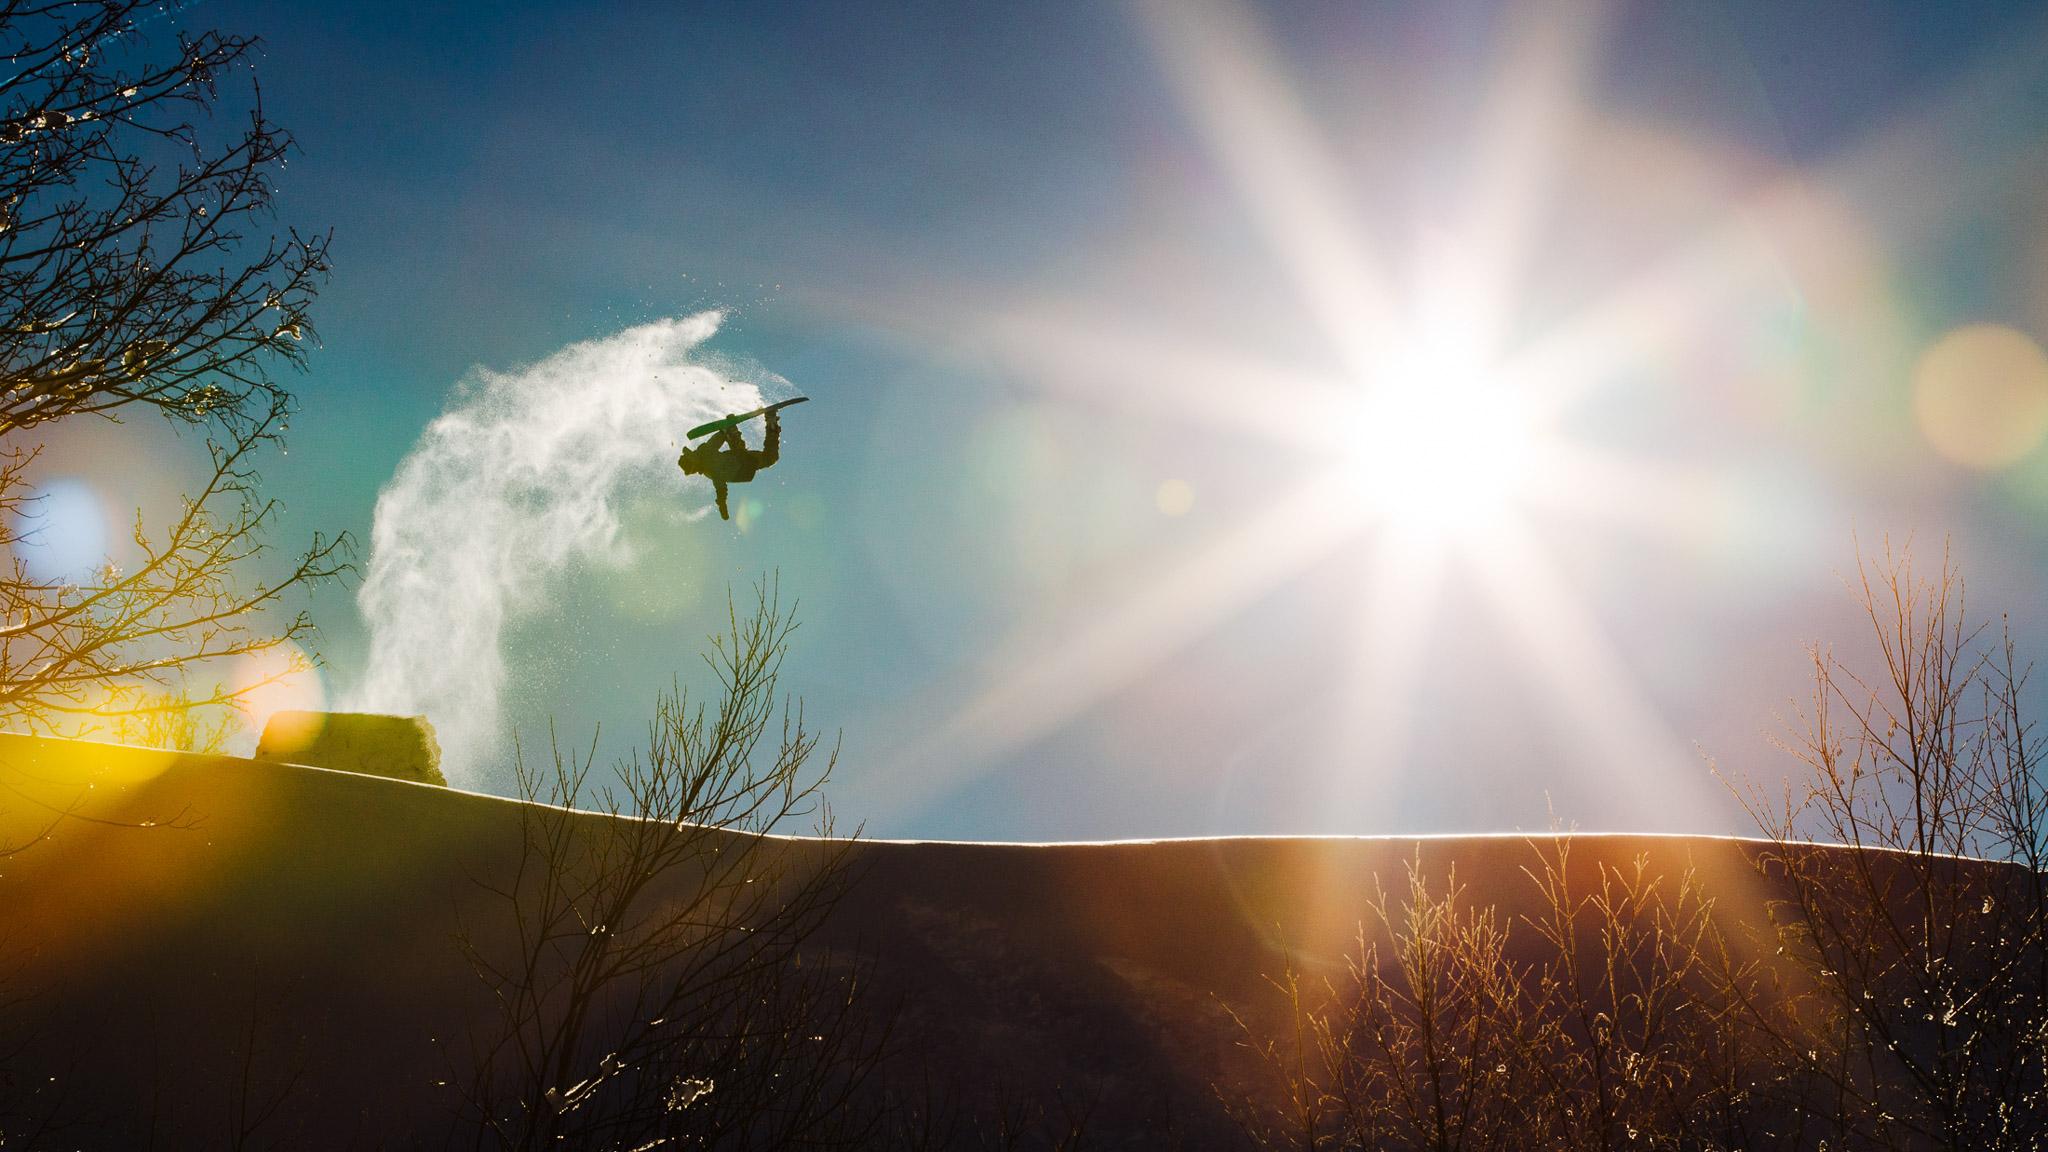 Mike Knobel, Switzerland